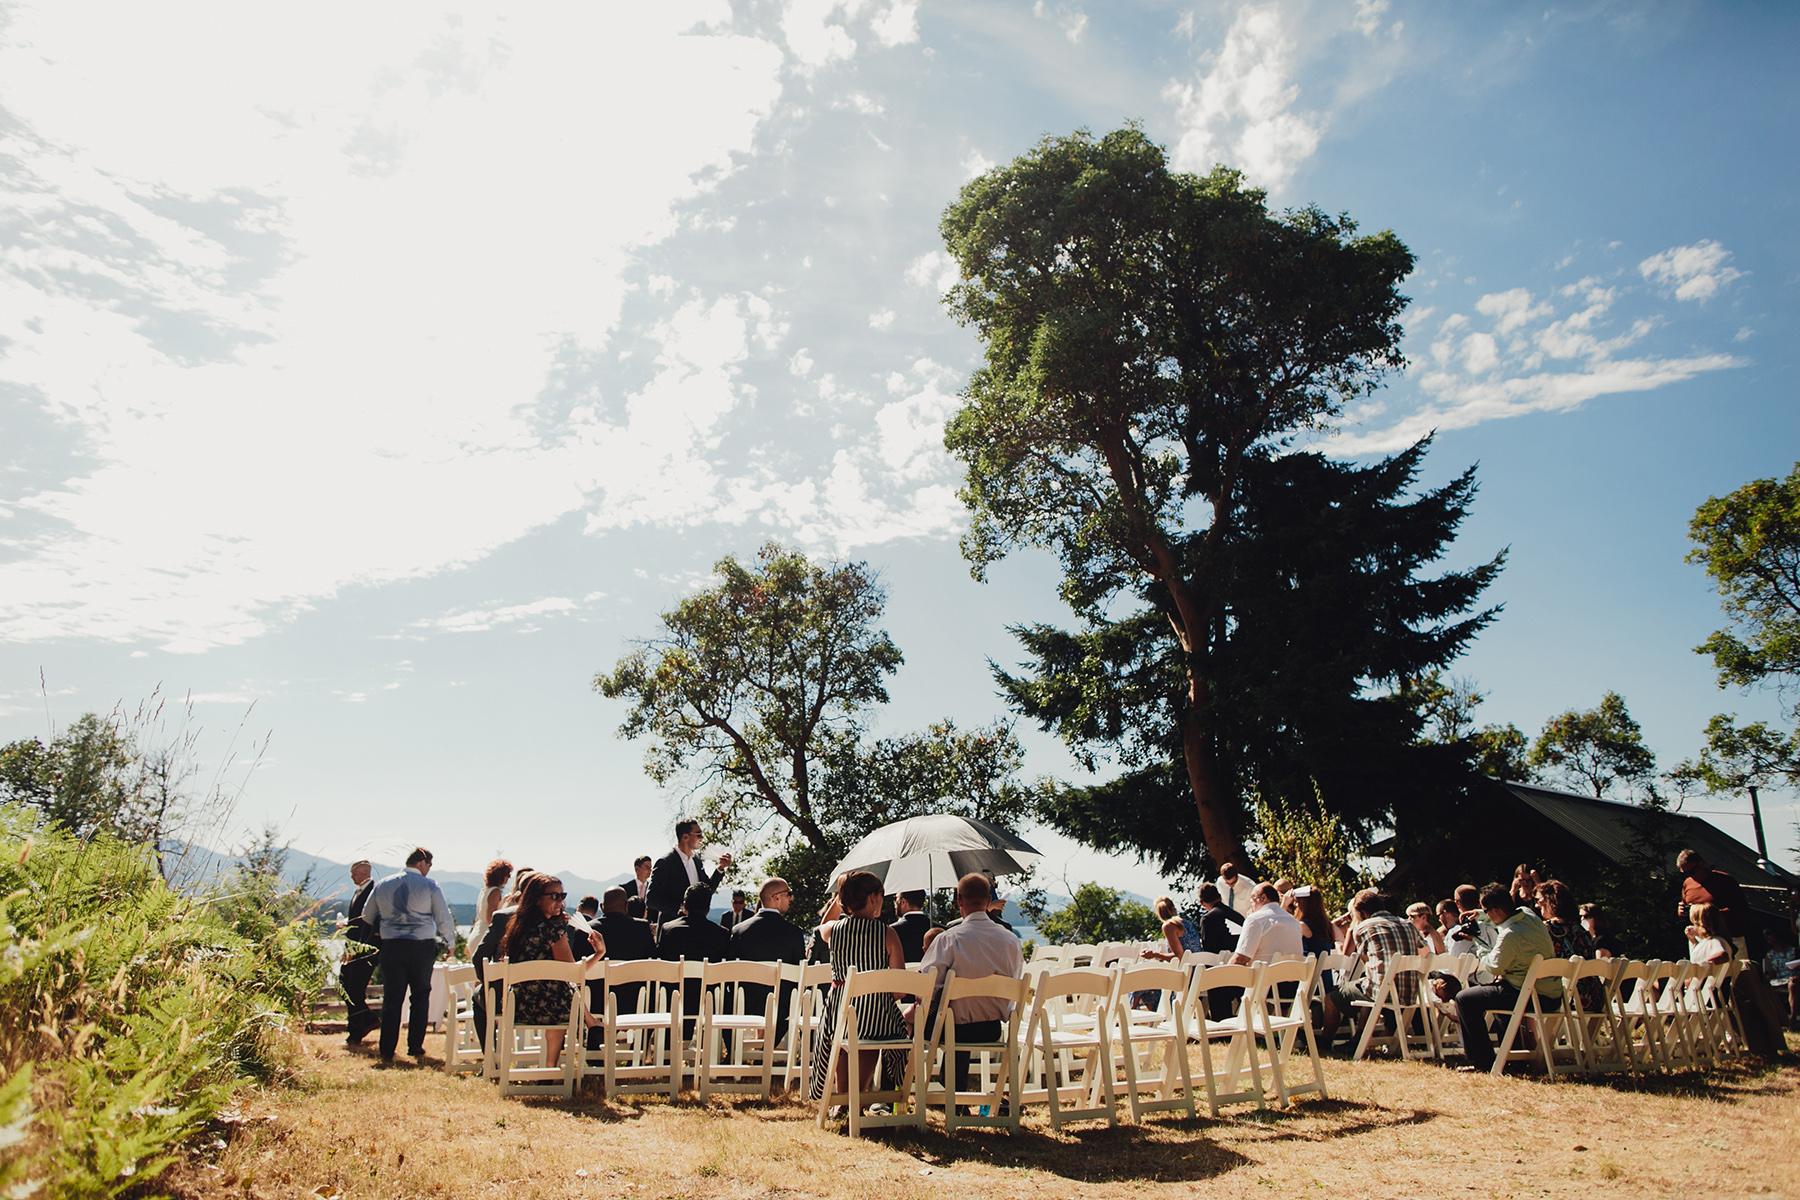 galiano-island-bodega-destination-wedding-0048.JPG